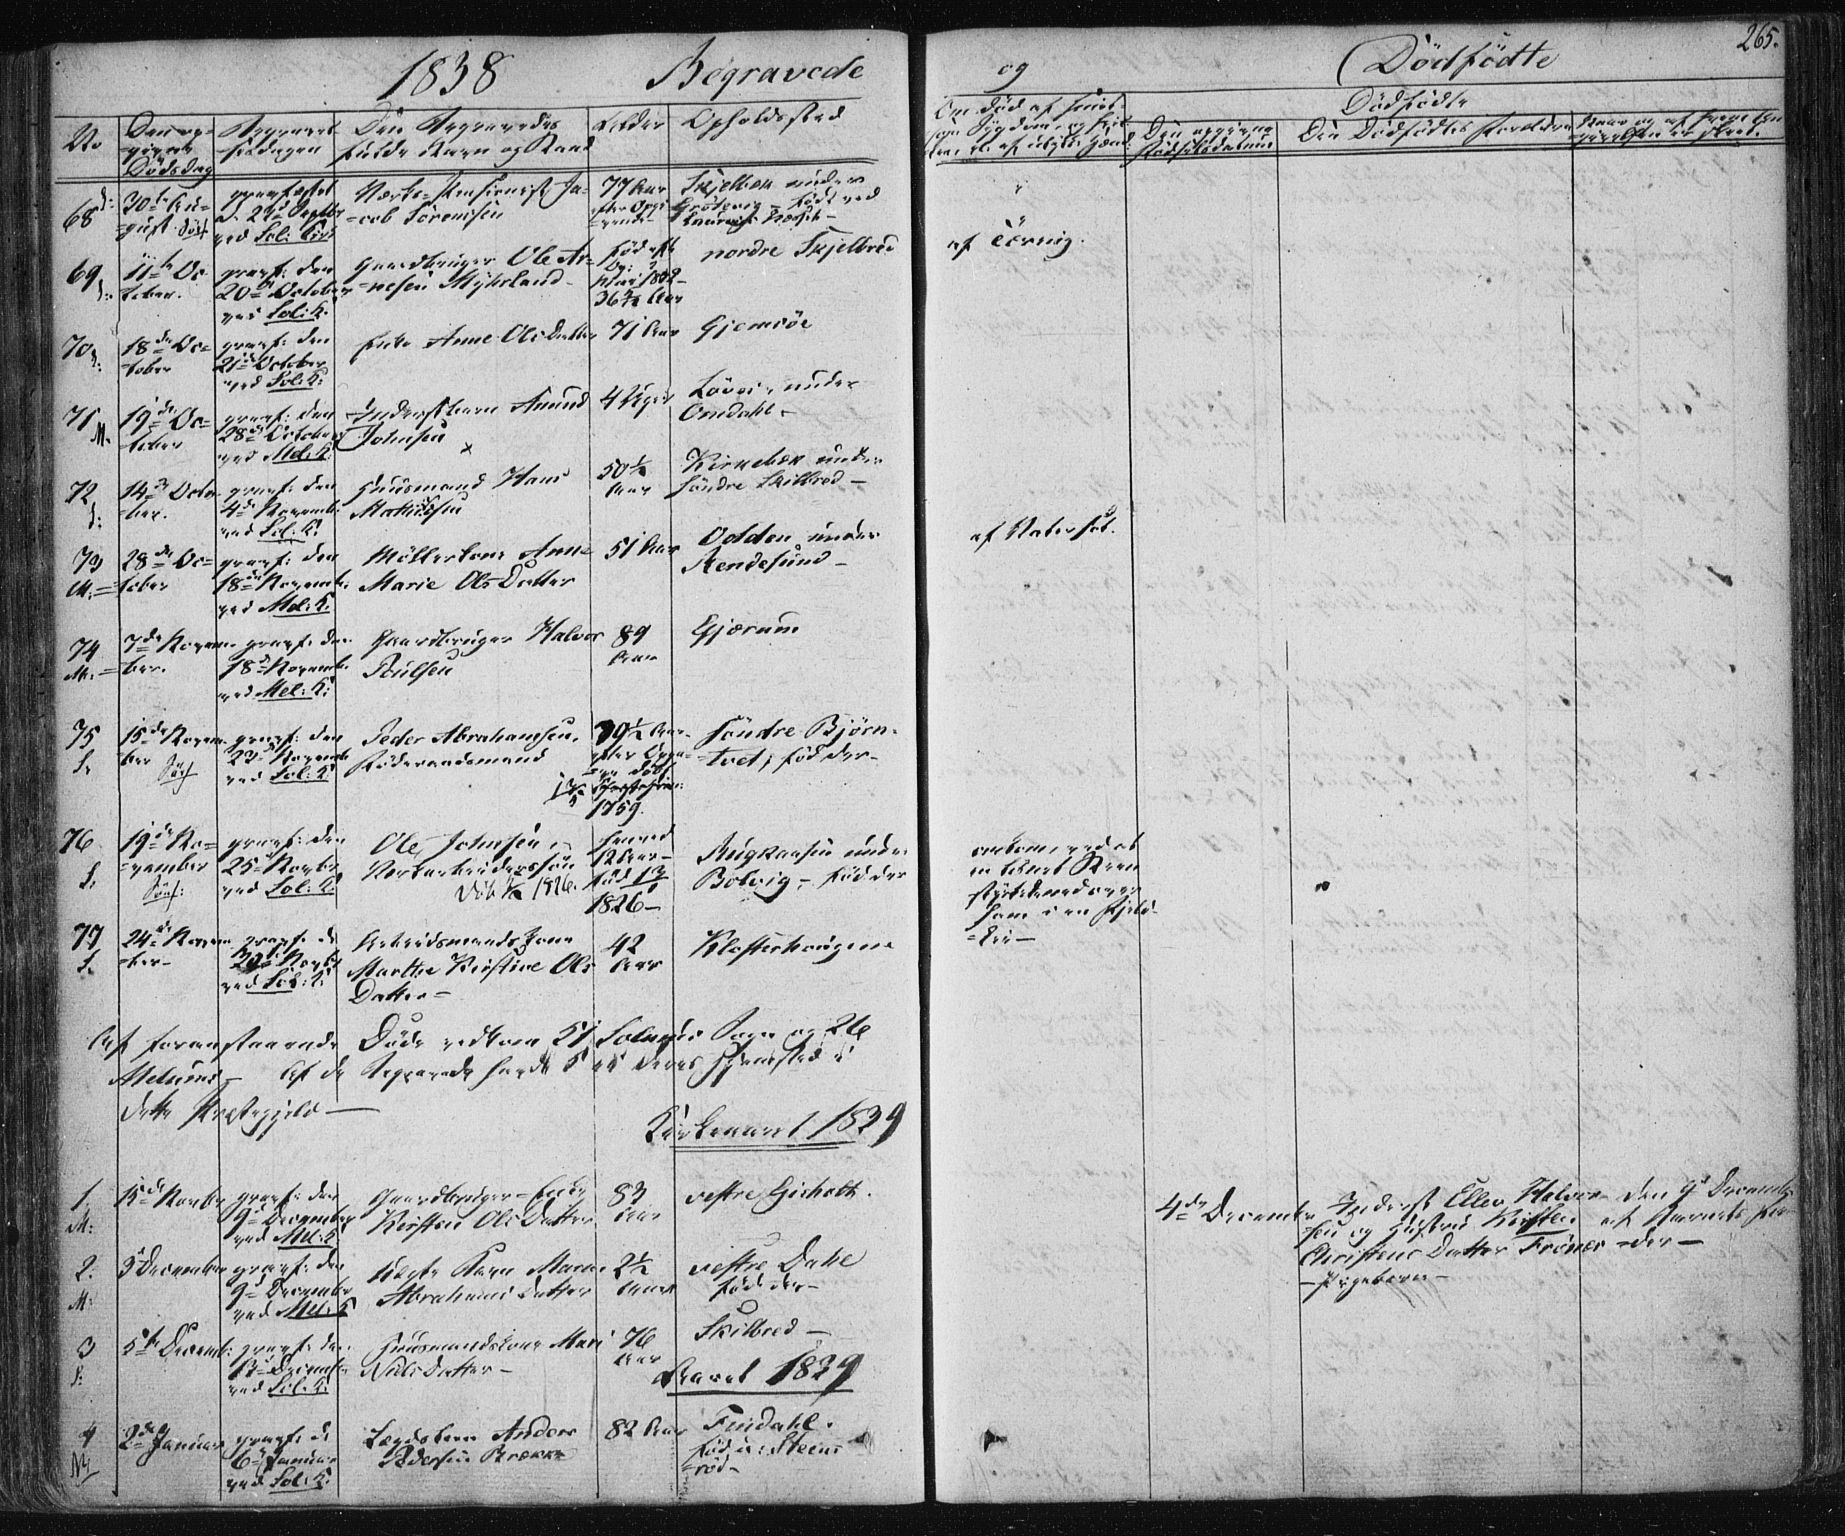 SAKO, Solum kirkebøker, F/Fa/L0005: Ministerialbok nr. I 5, 1833-1843, s. 265